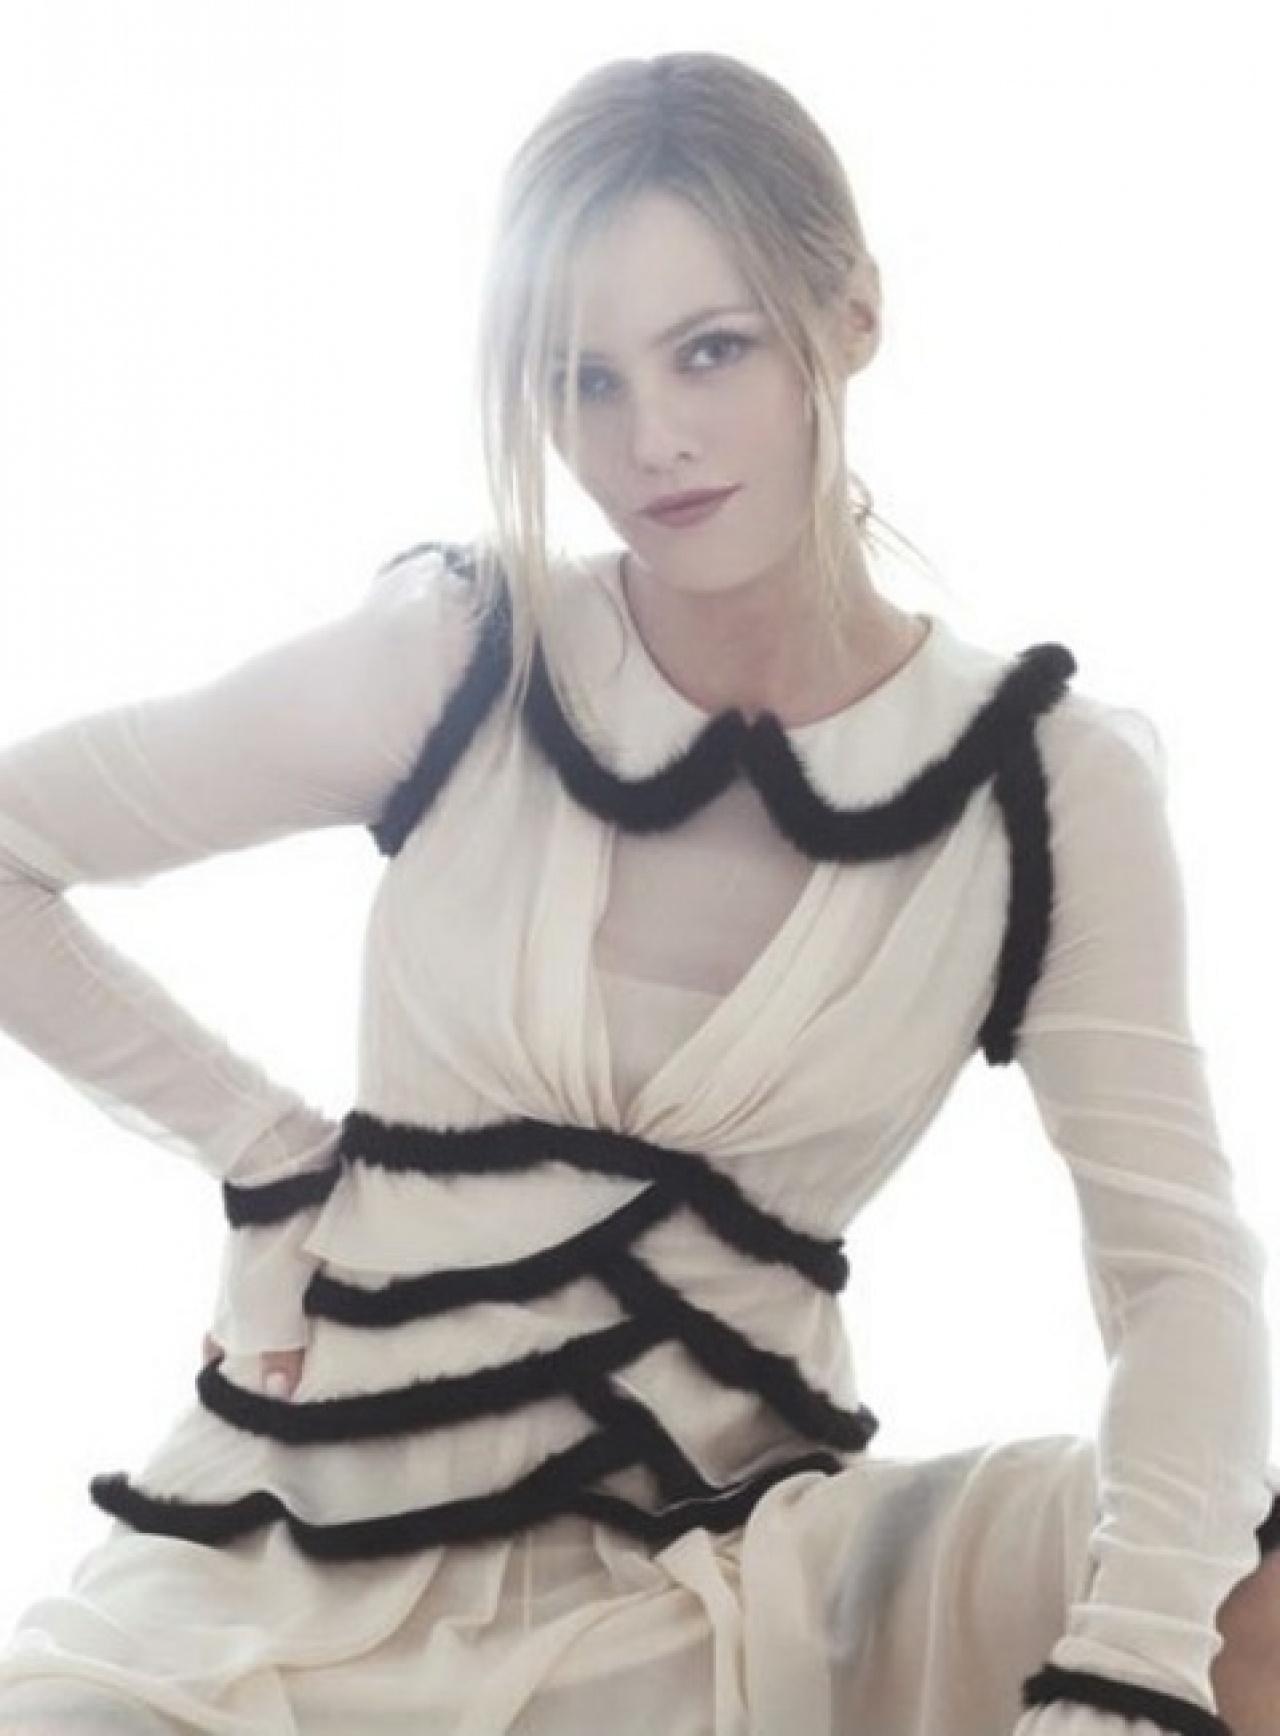 Vanessa Paradis(網上圖片)